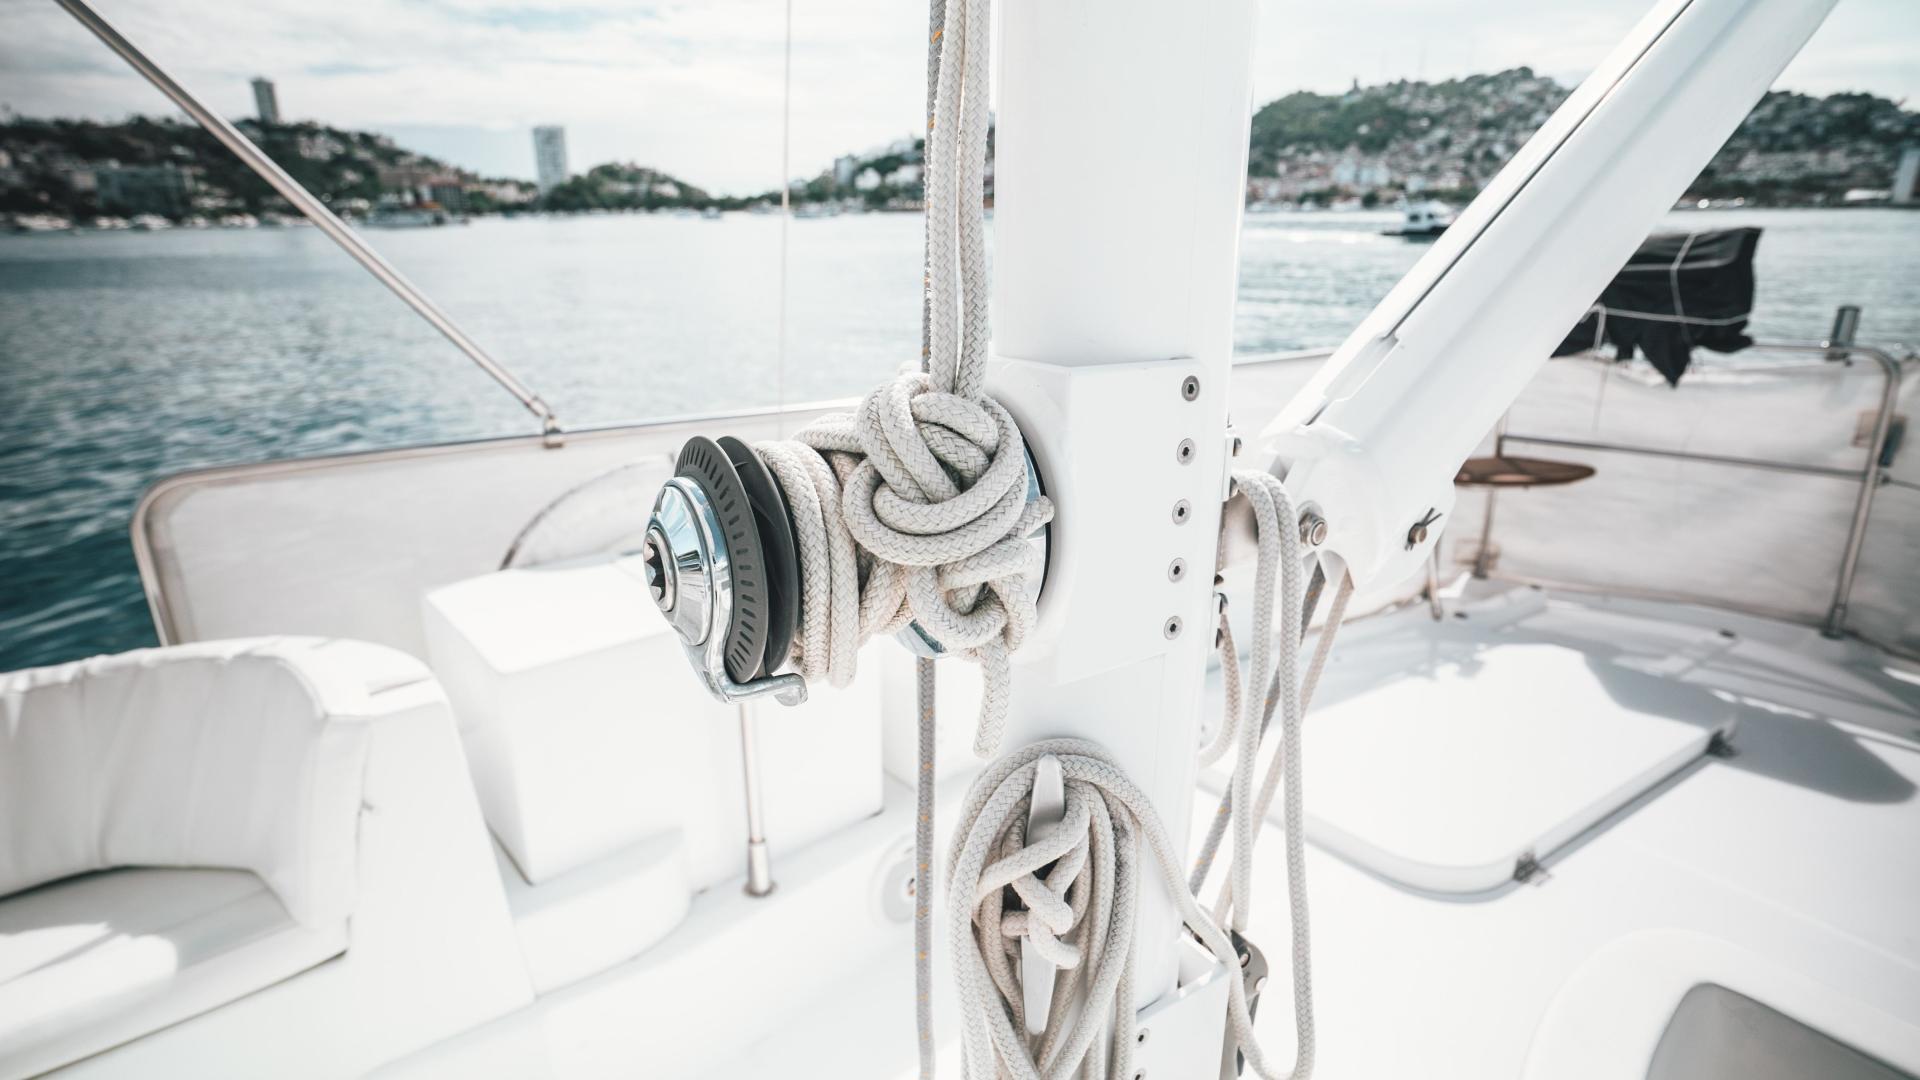 Beneteau-Swift Trawler 2008-Amadeus Acapulco-Mexico-1487044 | Thumbnail